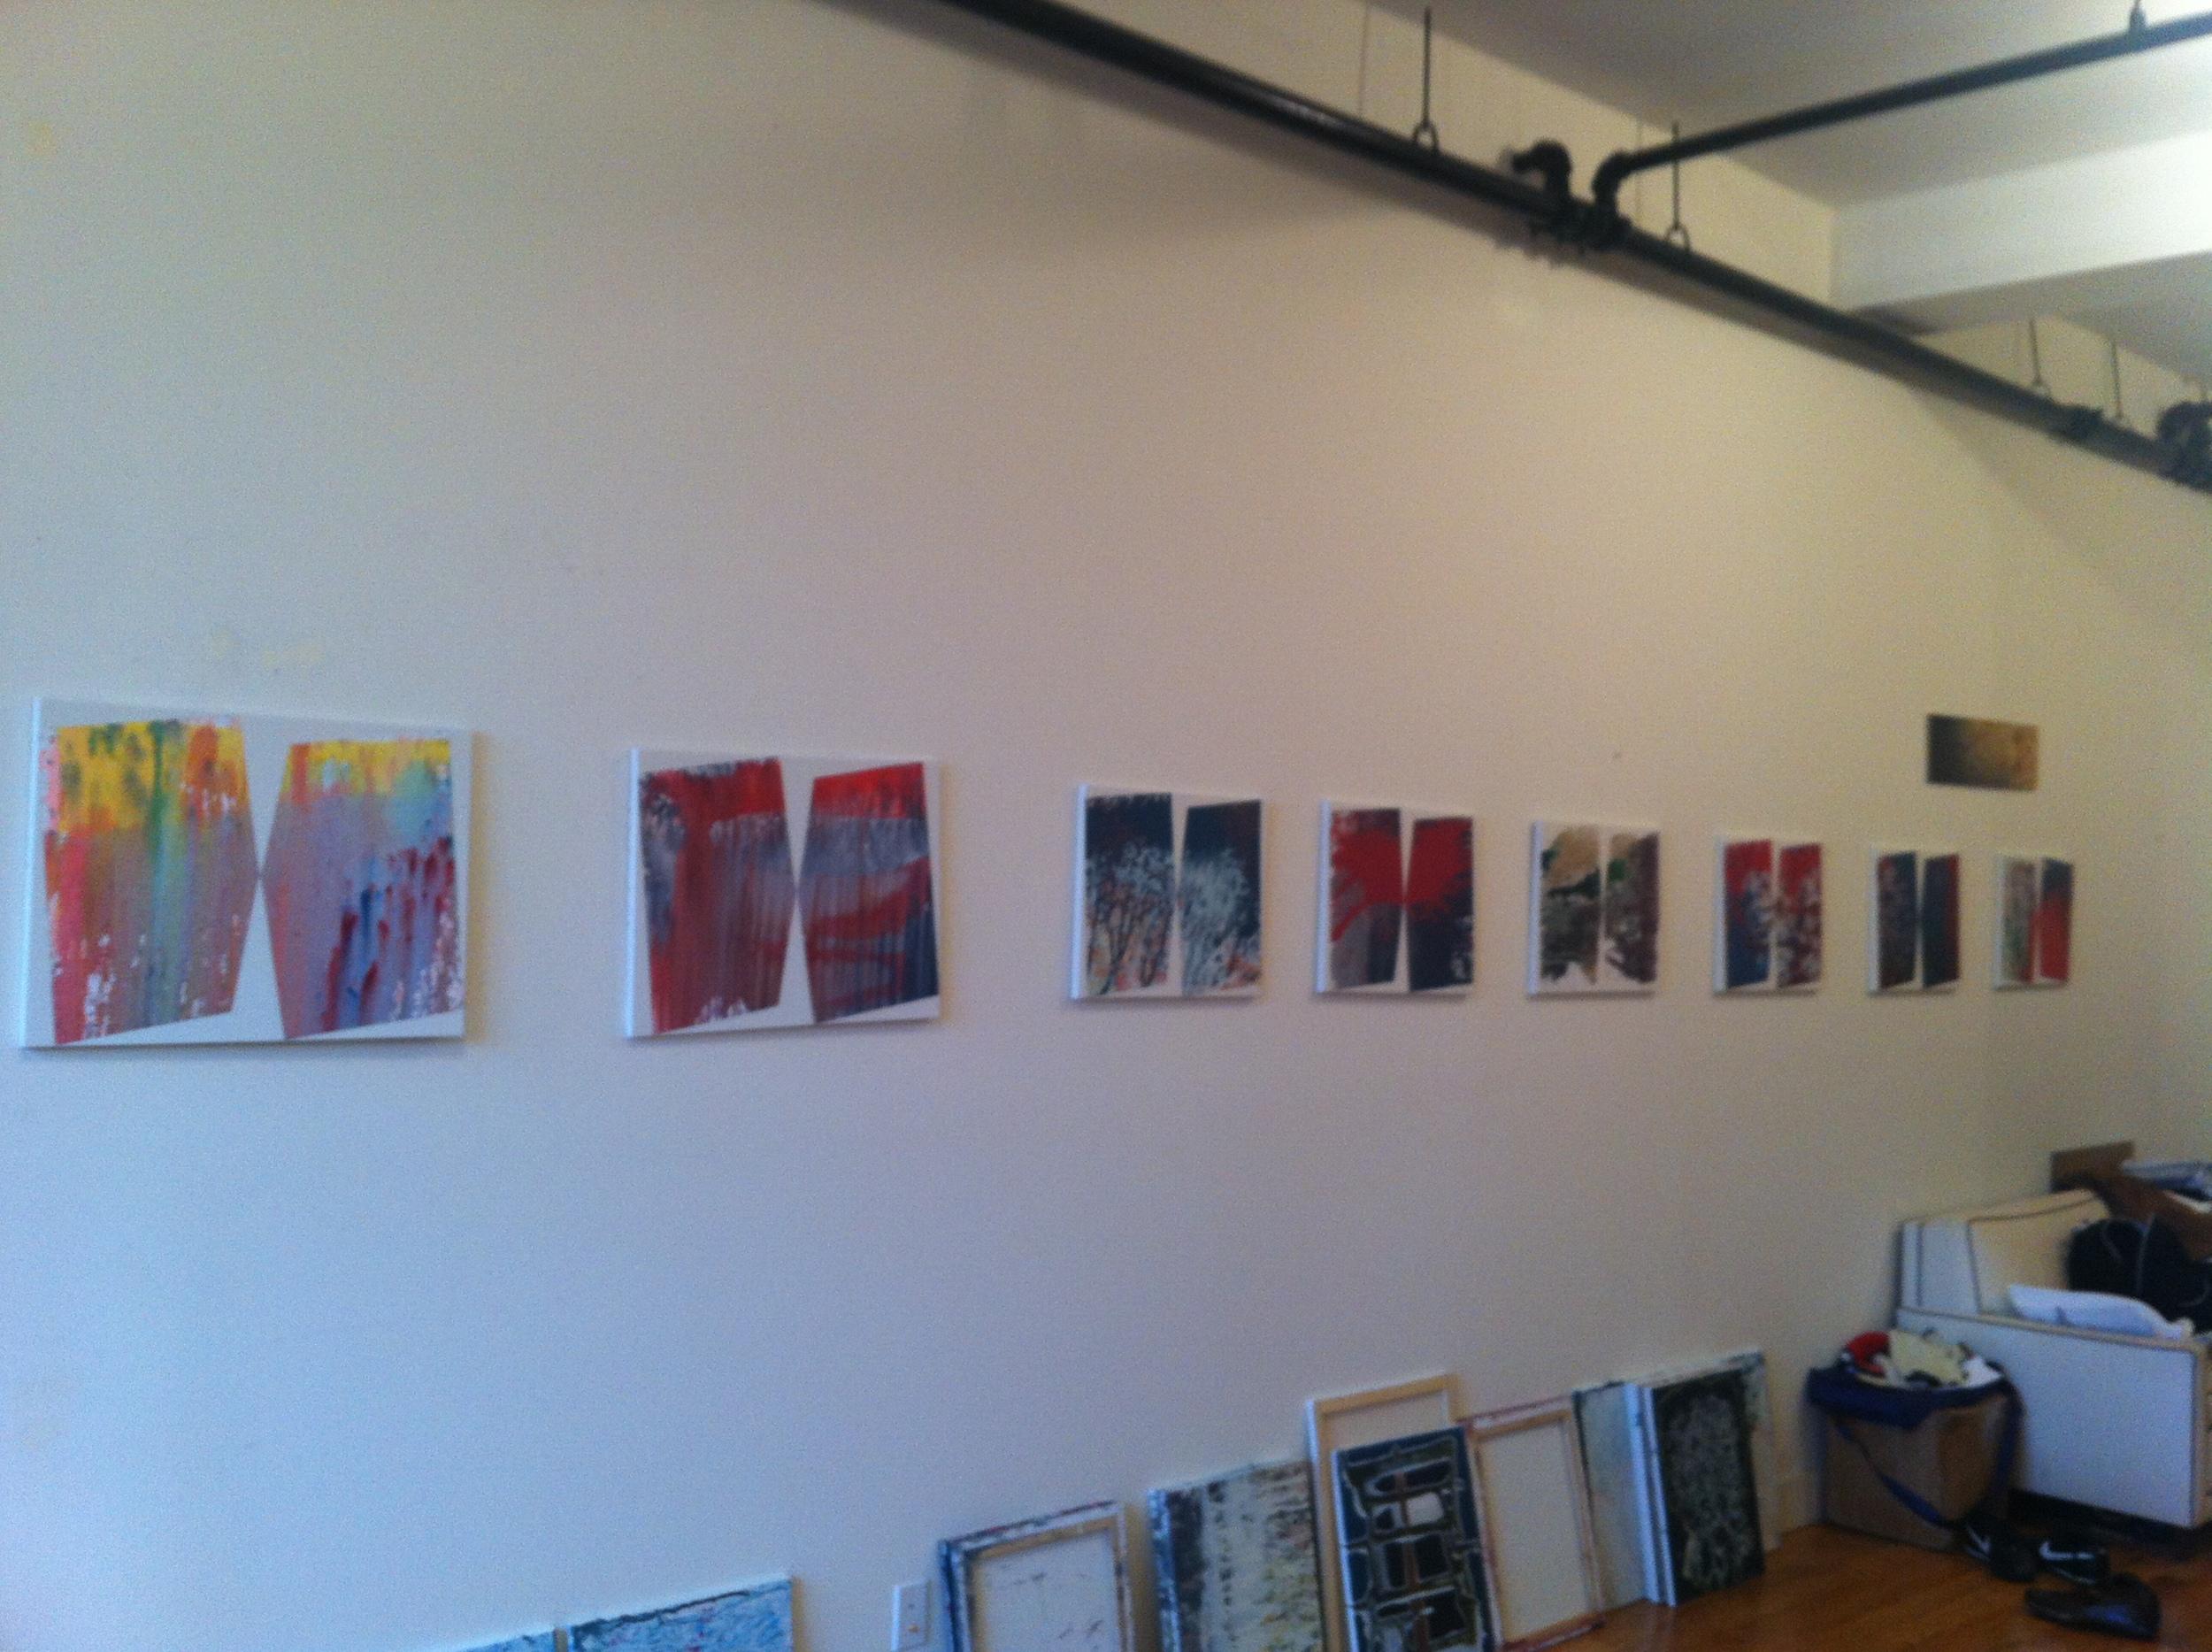 Brian Meola's studio in Bushwick, Brooklyn